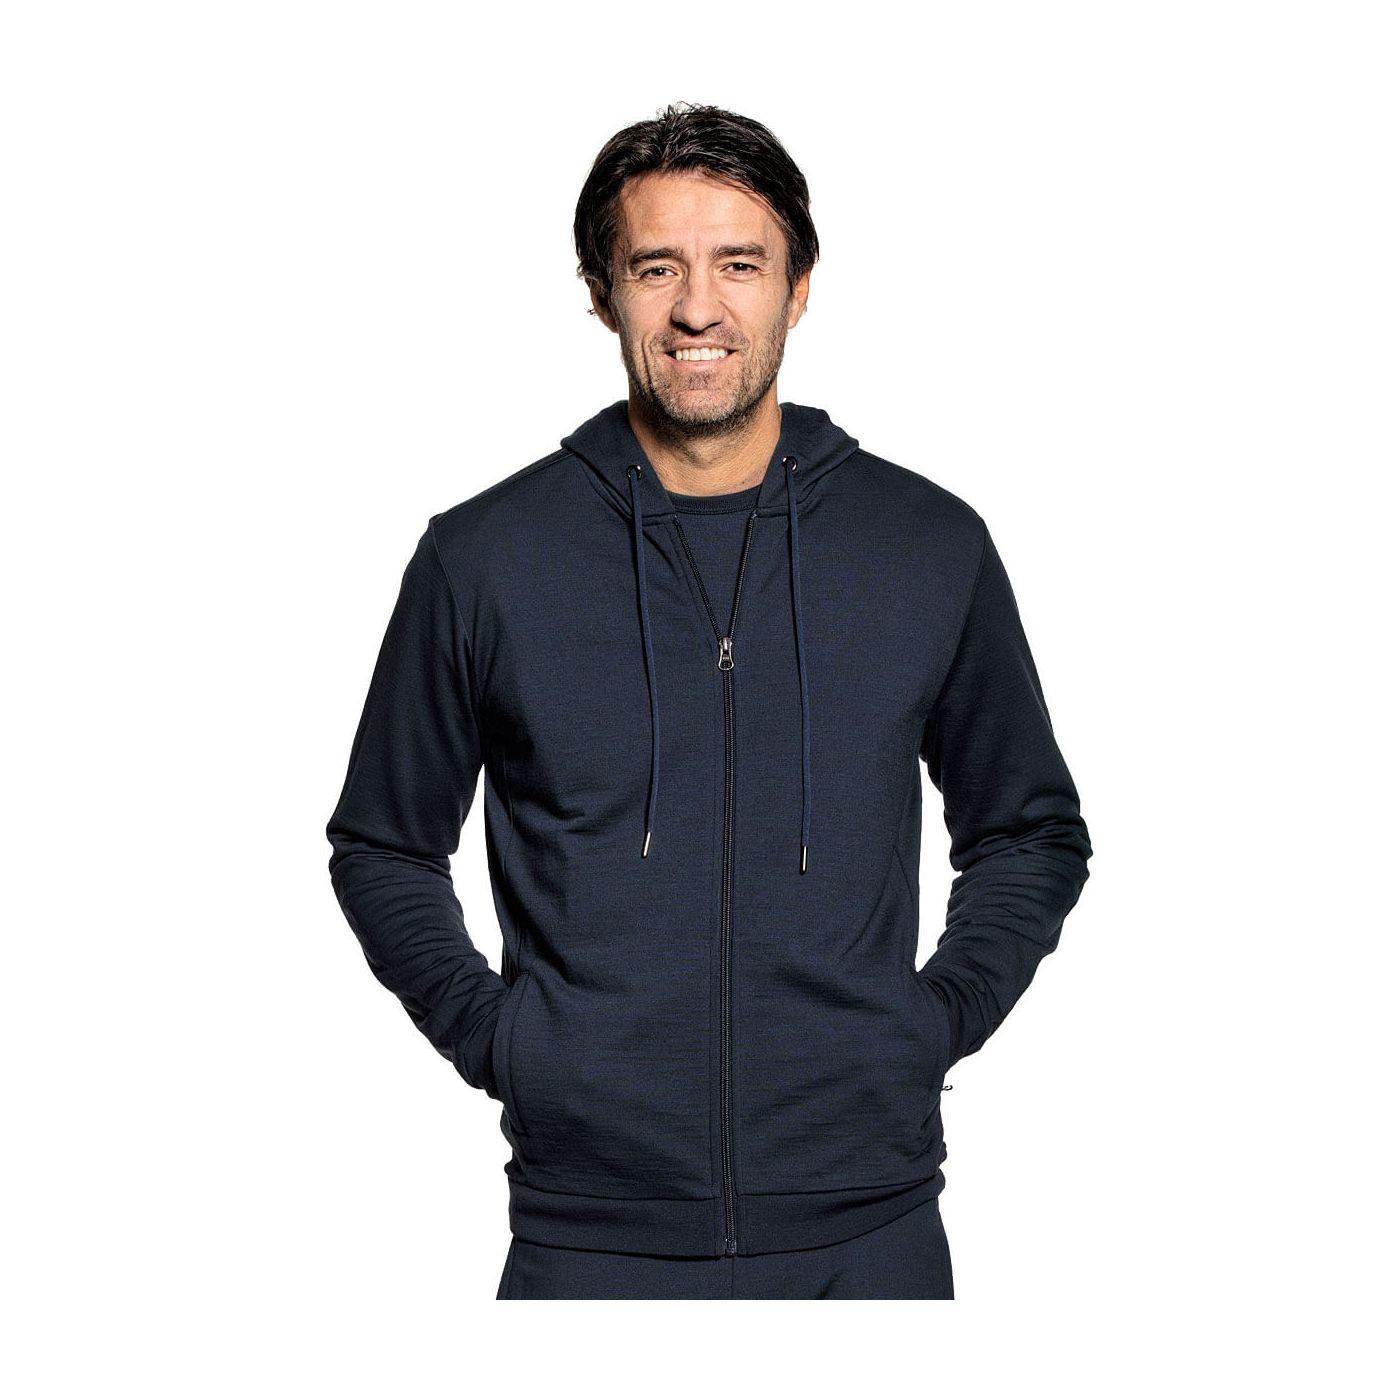 Hoodie with zipper for men made of Merino wool in Dark blue